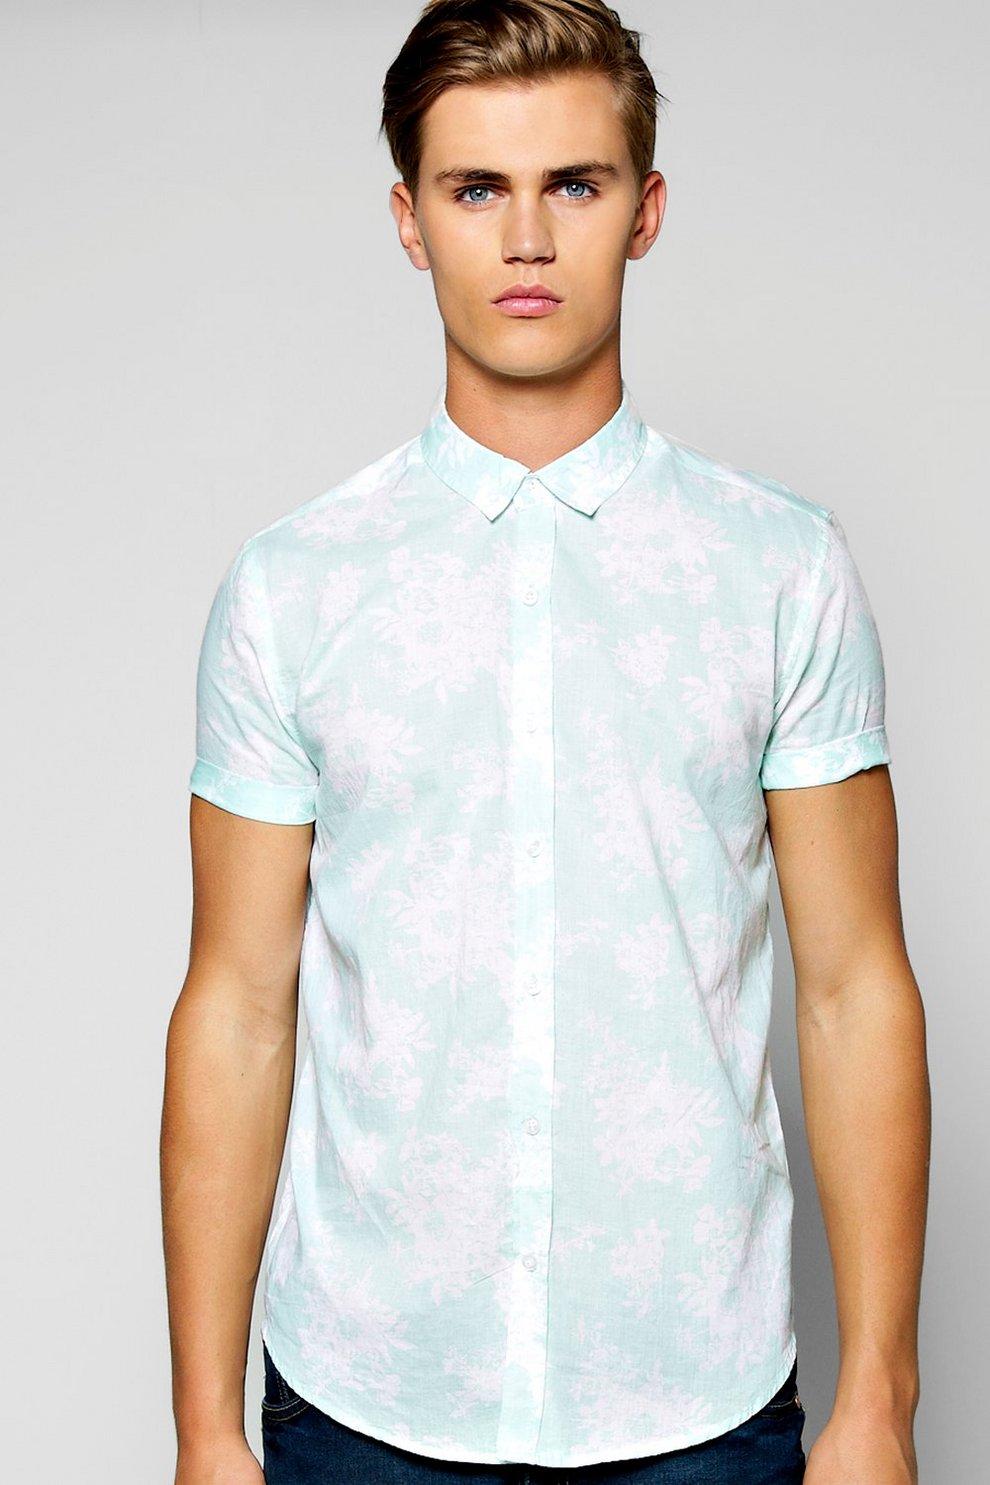 cd8344fc Mens Short Sleeve Hawaiian Shirt. Hover to zoom